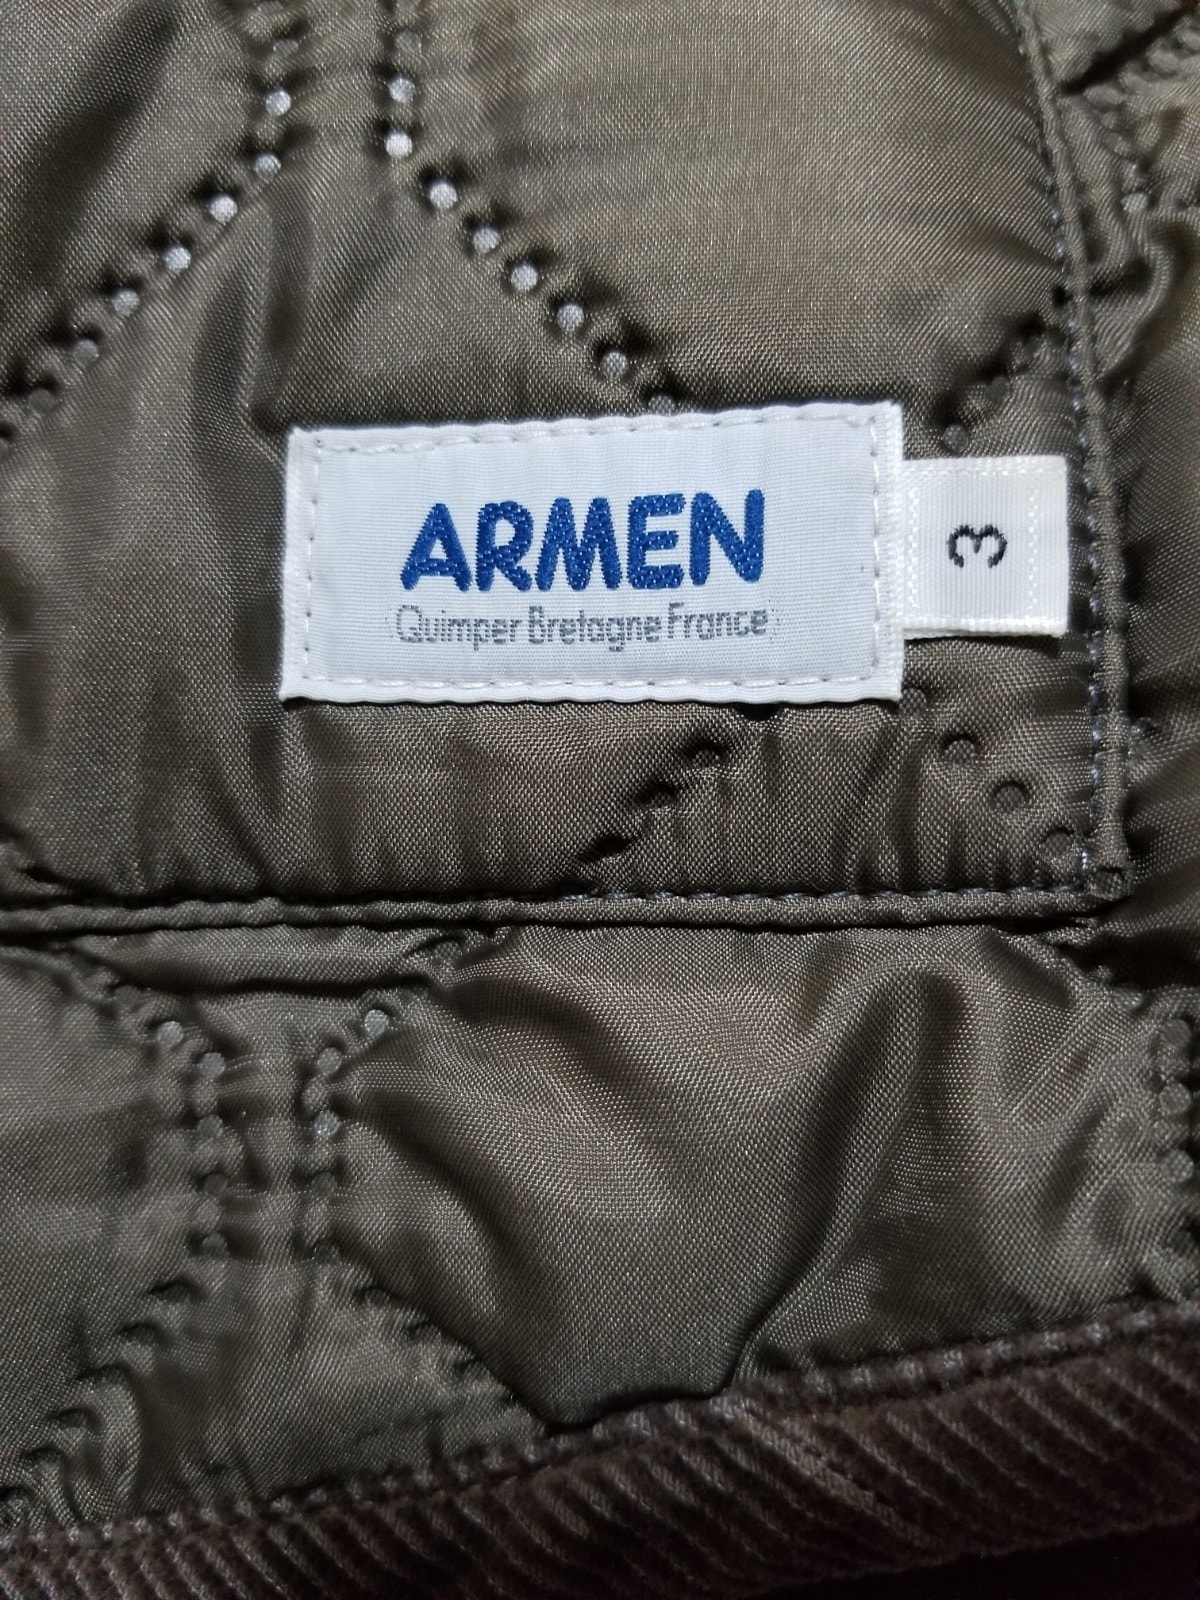 ARMEN(アーメン)のブルゾン